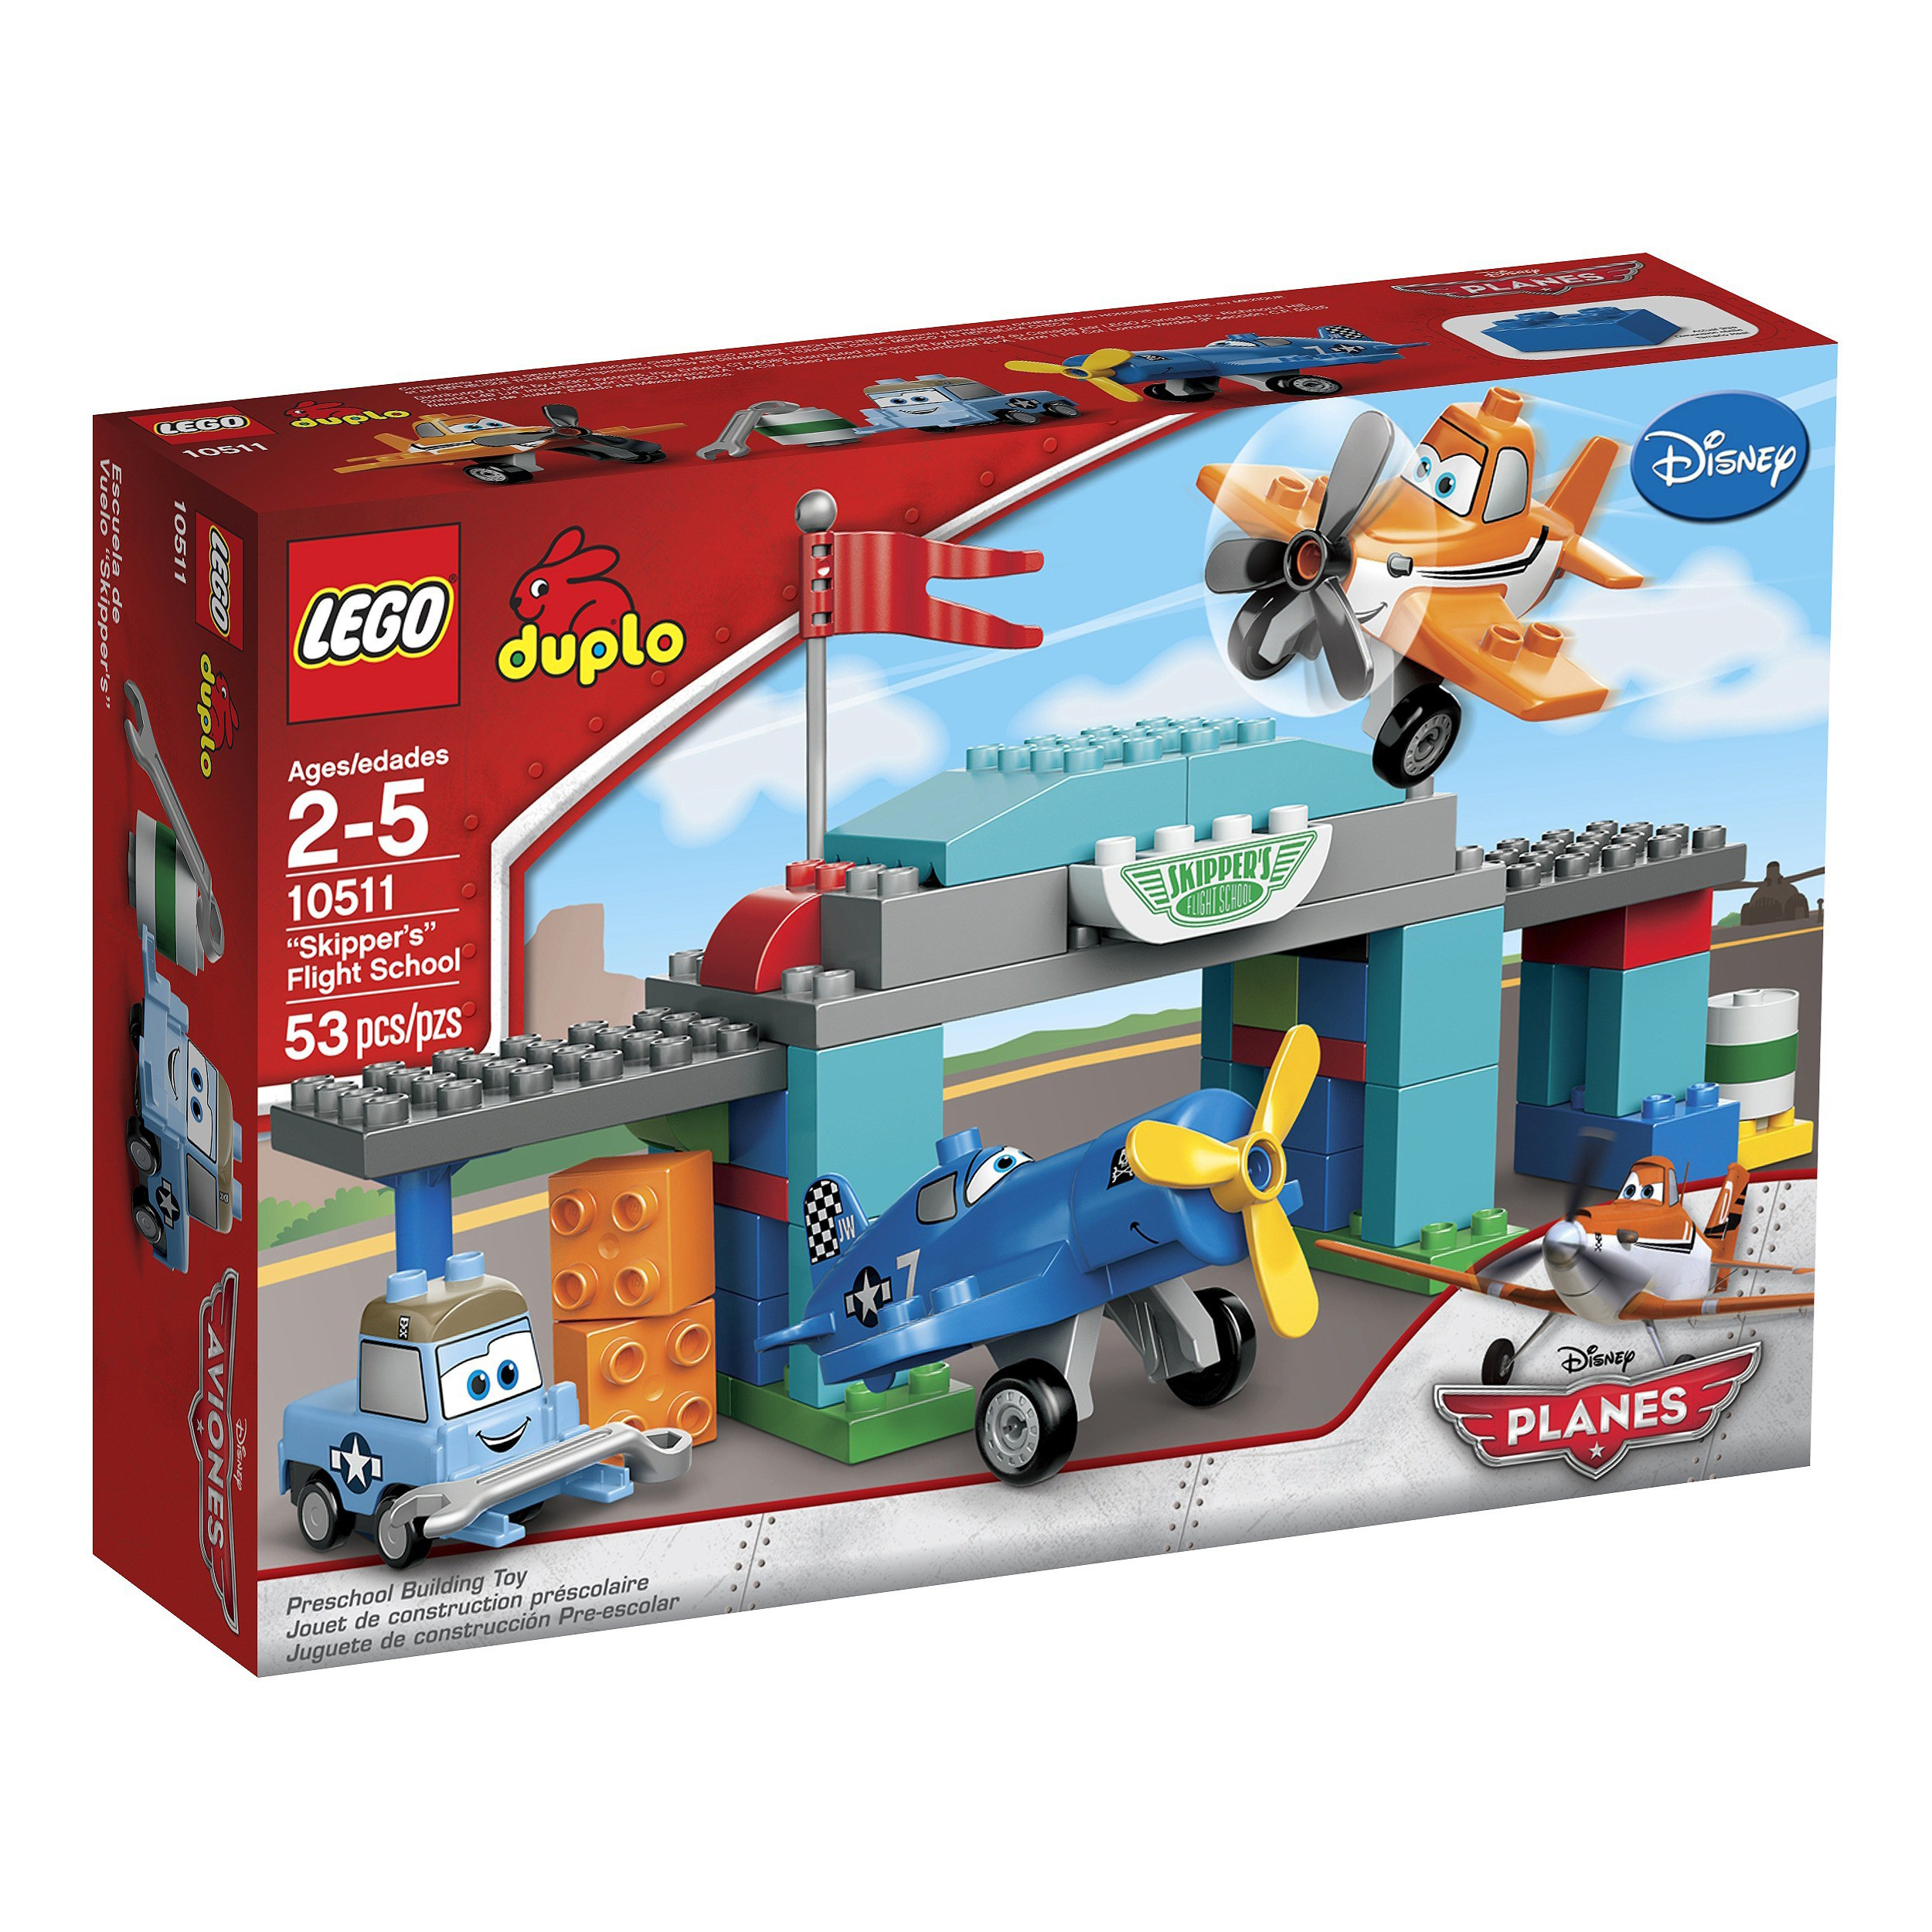 Do choi xep hinh lego Duplo 1051